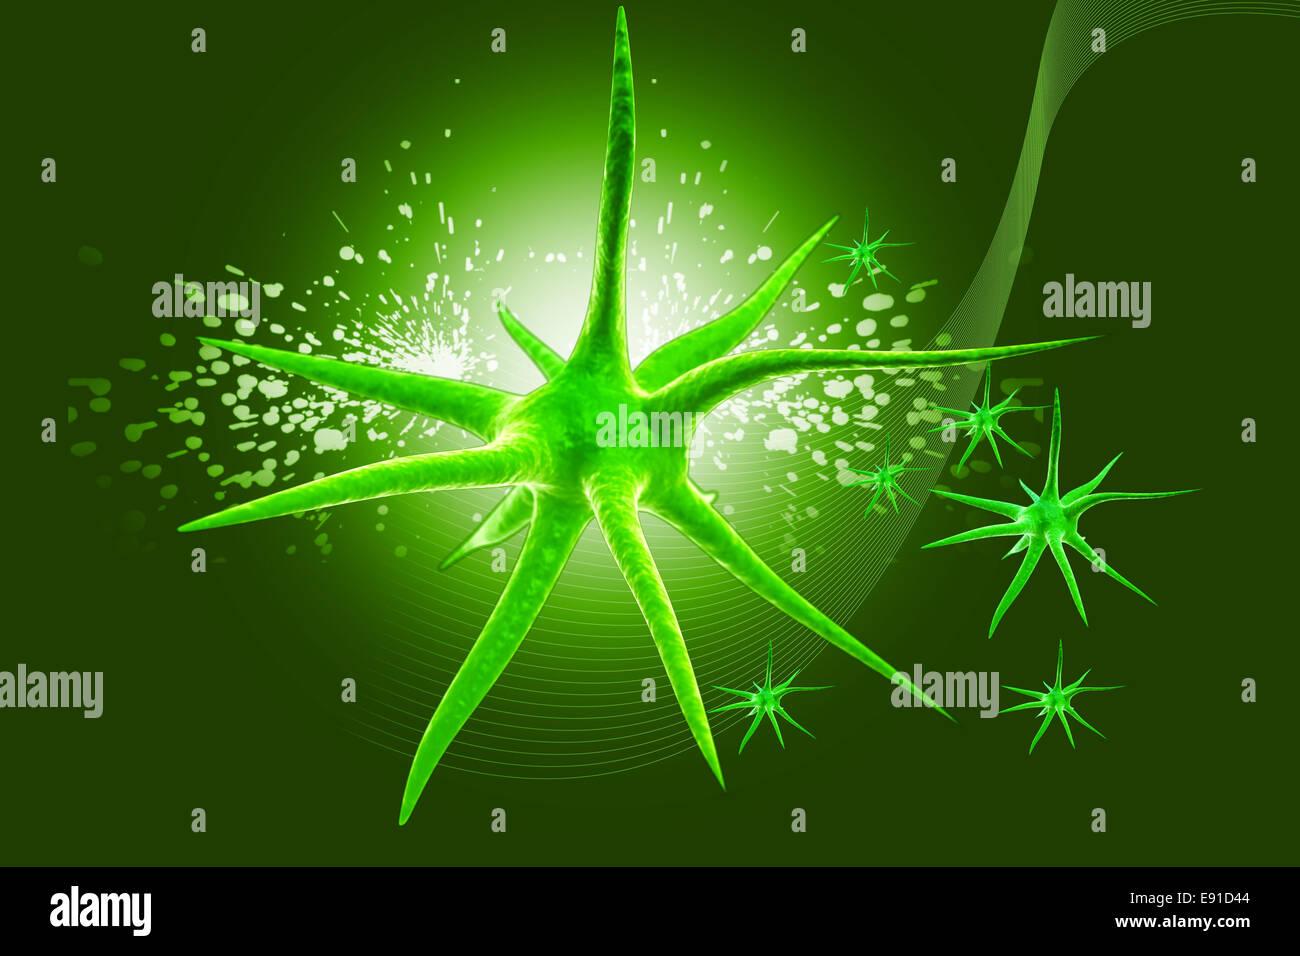 Neuron - Stock Image